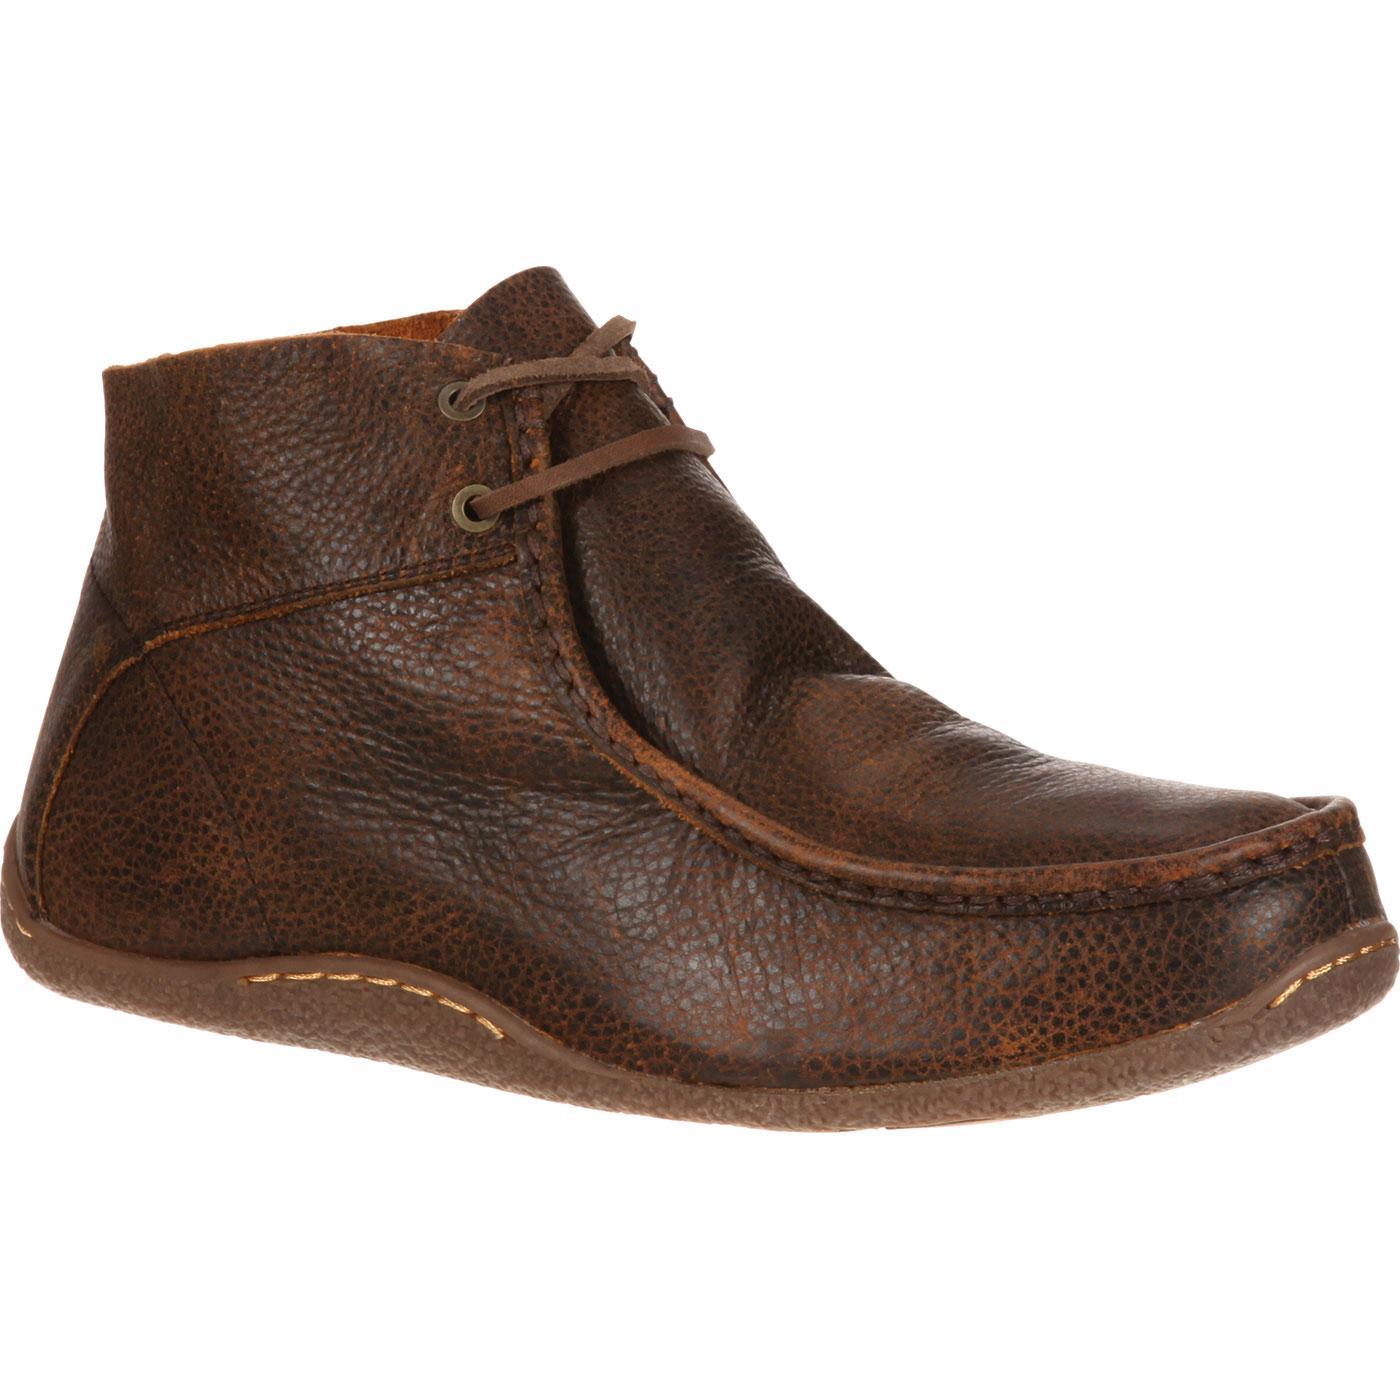 Mens' Brown Leather Wallabee Chukka Durango City Santa Fe DDB0063